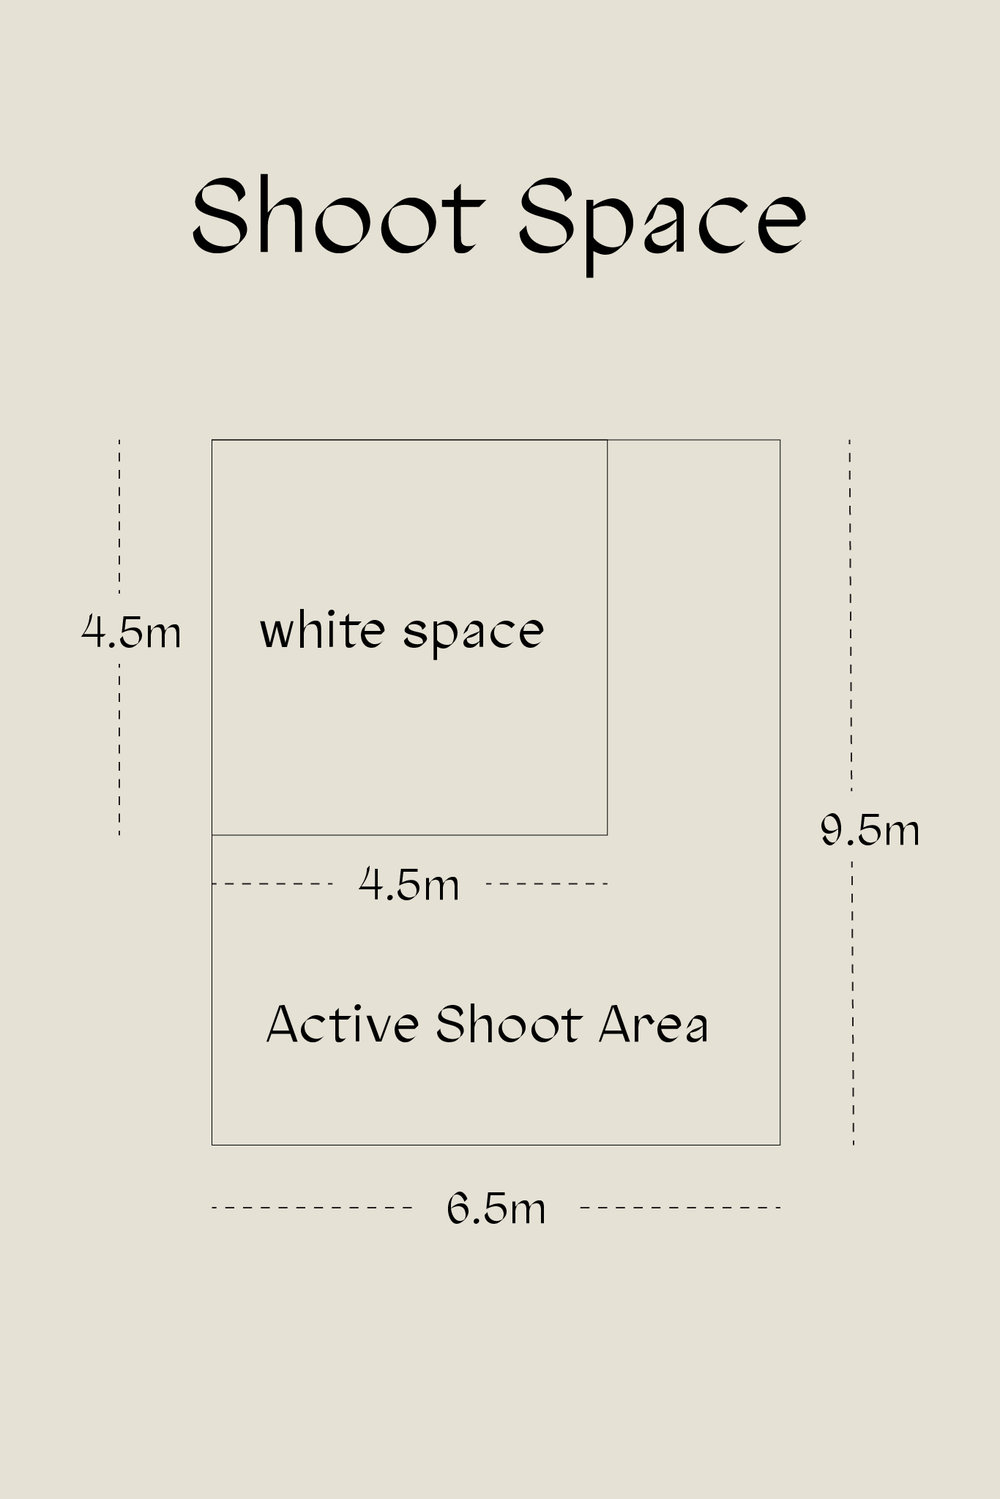 Shoot Space Map.jpg